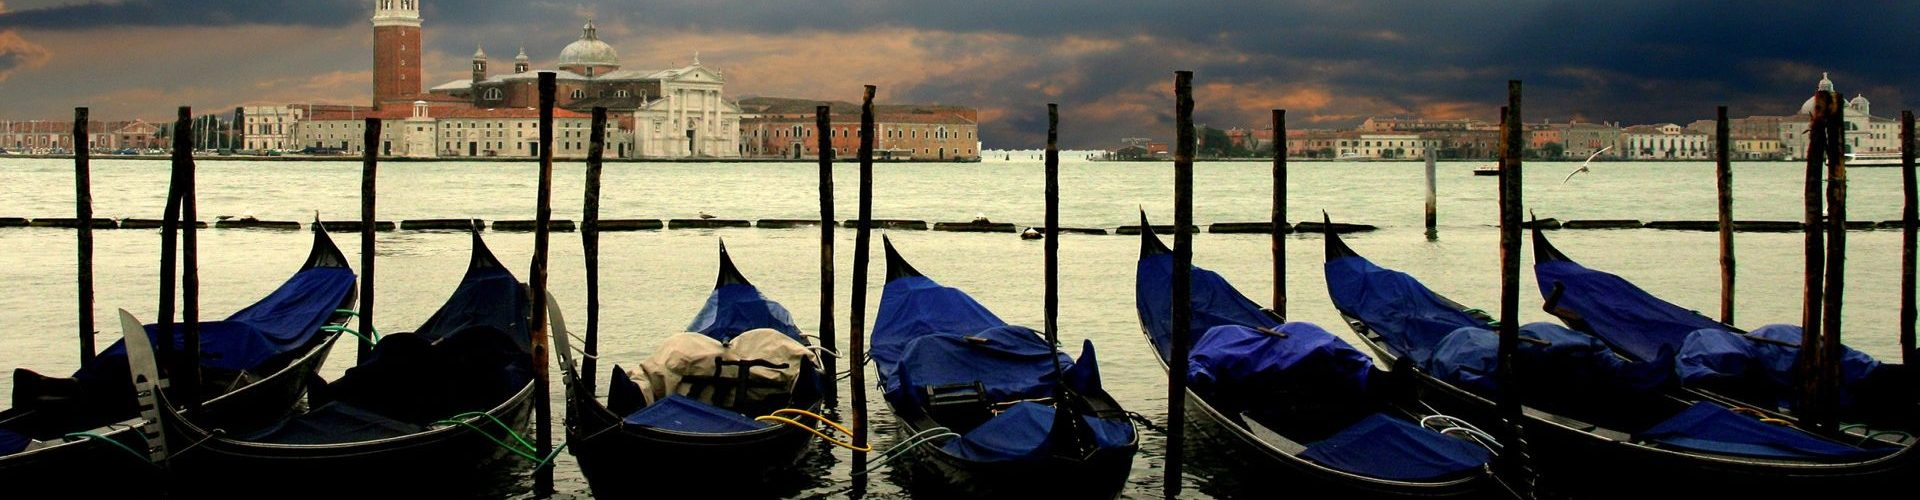 נציה, איטליה